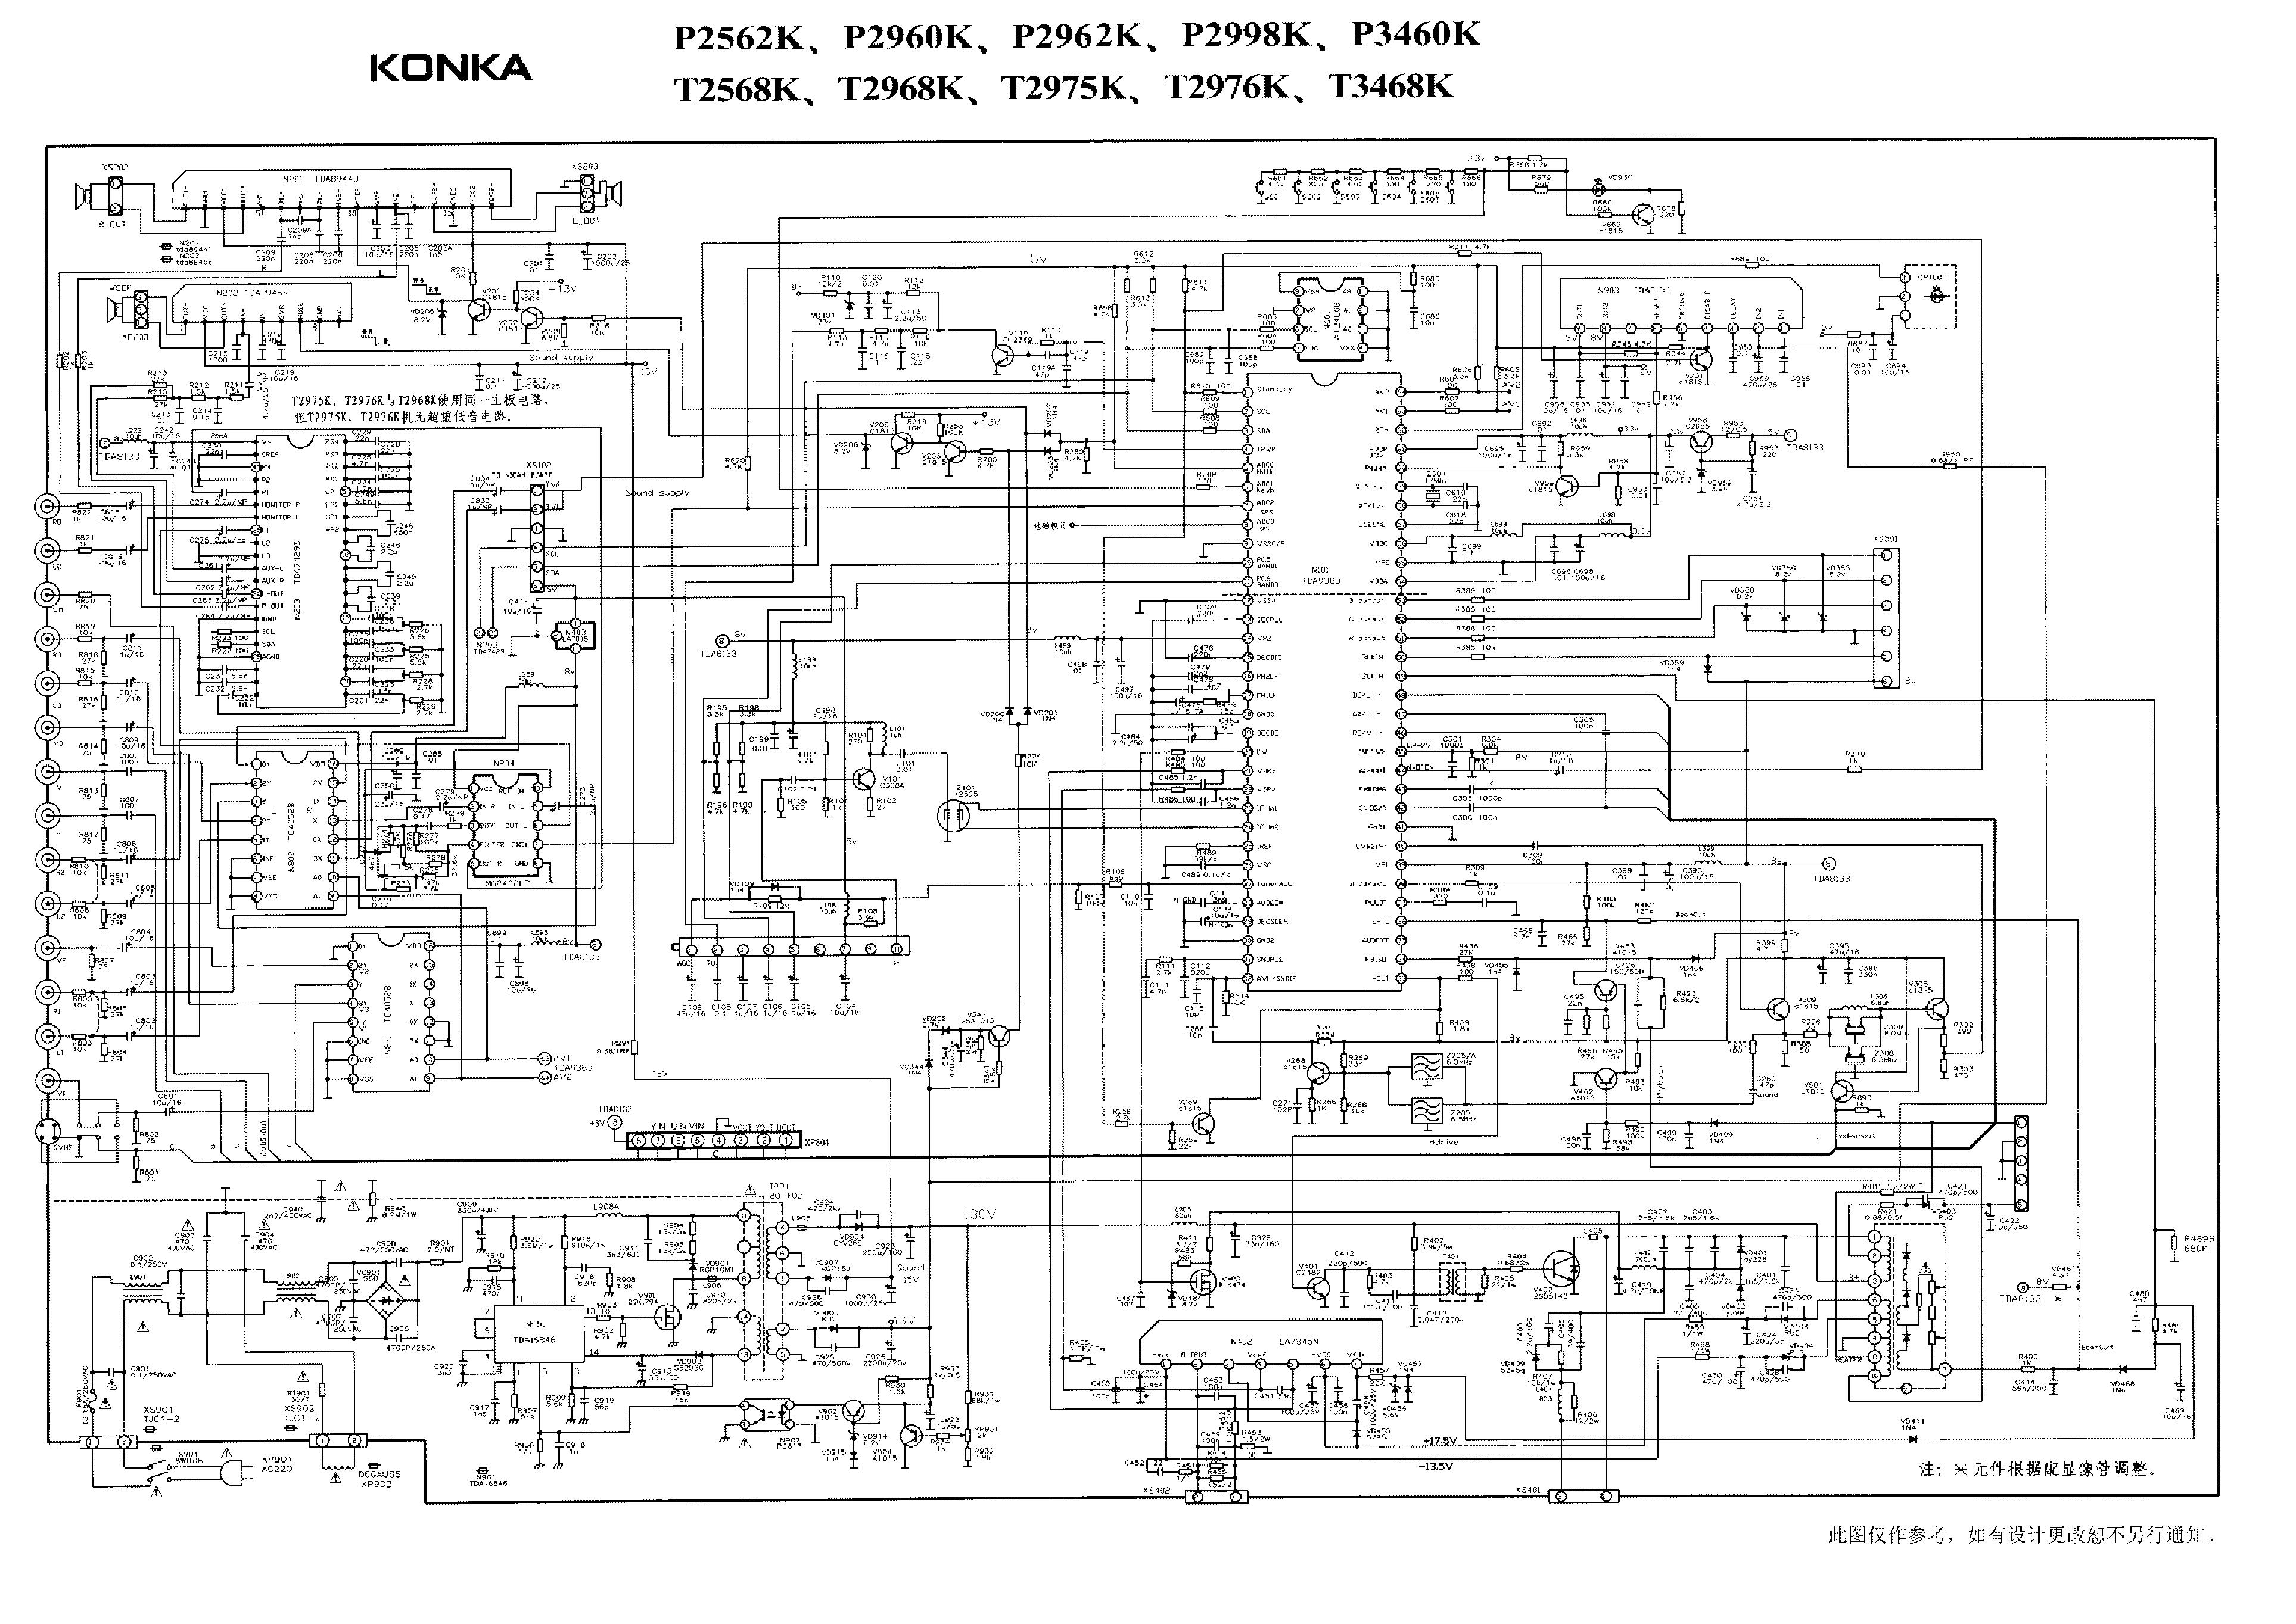 Powernetics Ups Wiring Schematic Schematics Diagrams Us Electrical Diagram Circuit Pdf Download Rh 9xmaza Basic